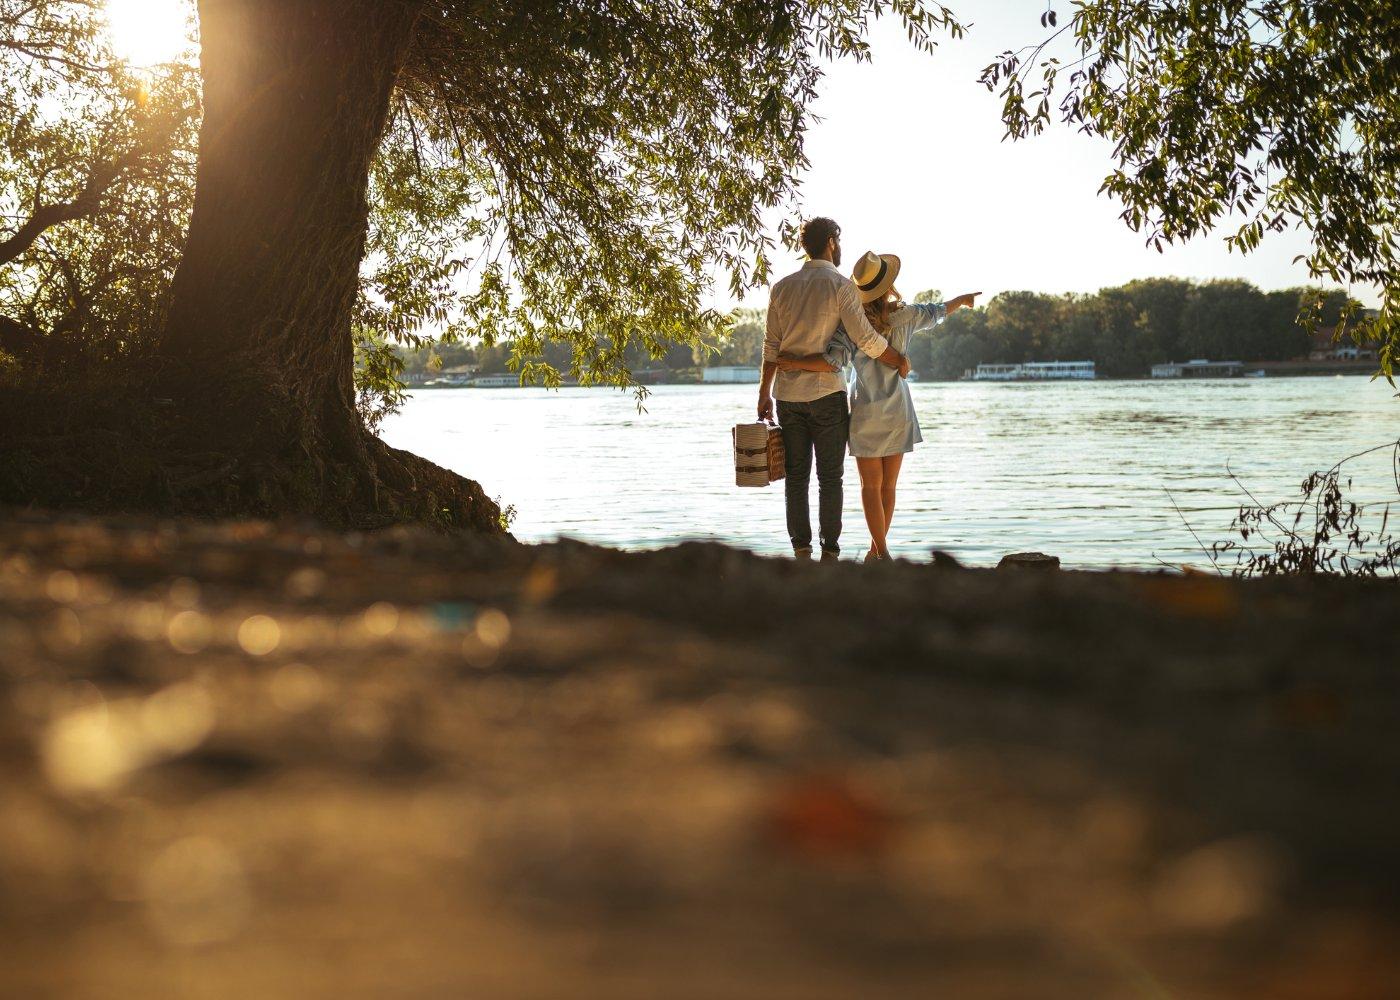 Casal em praia fluvial